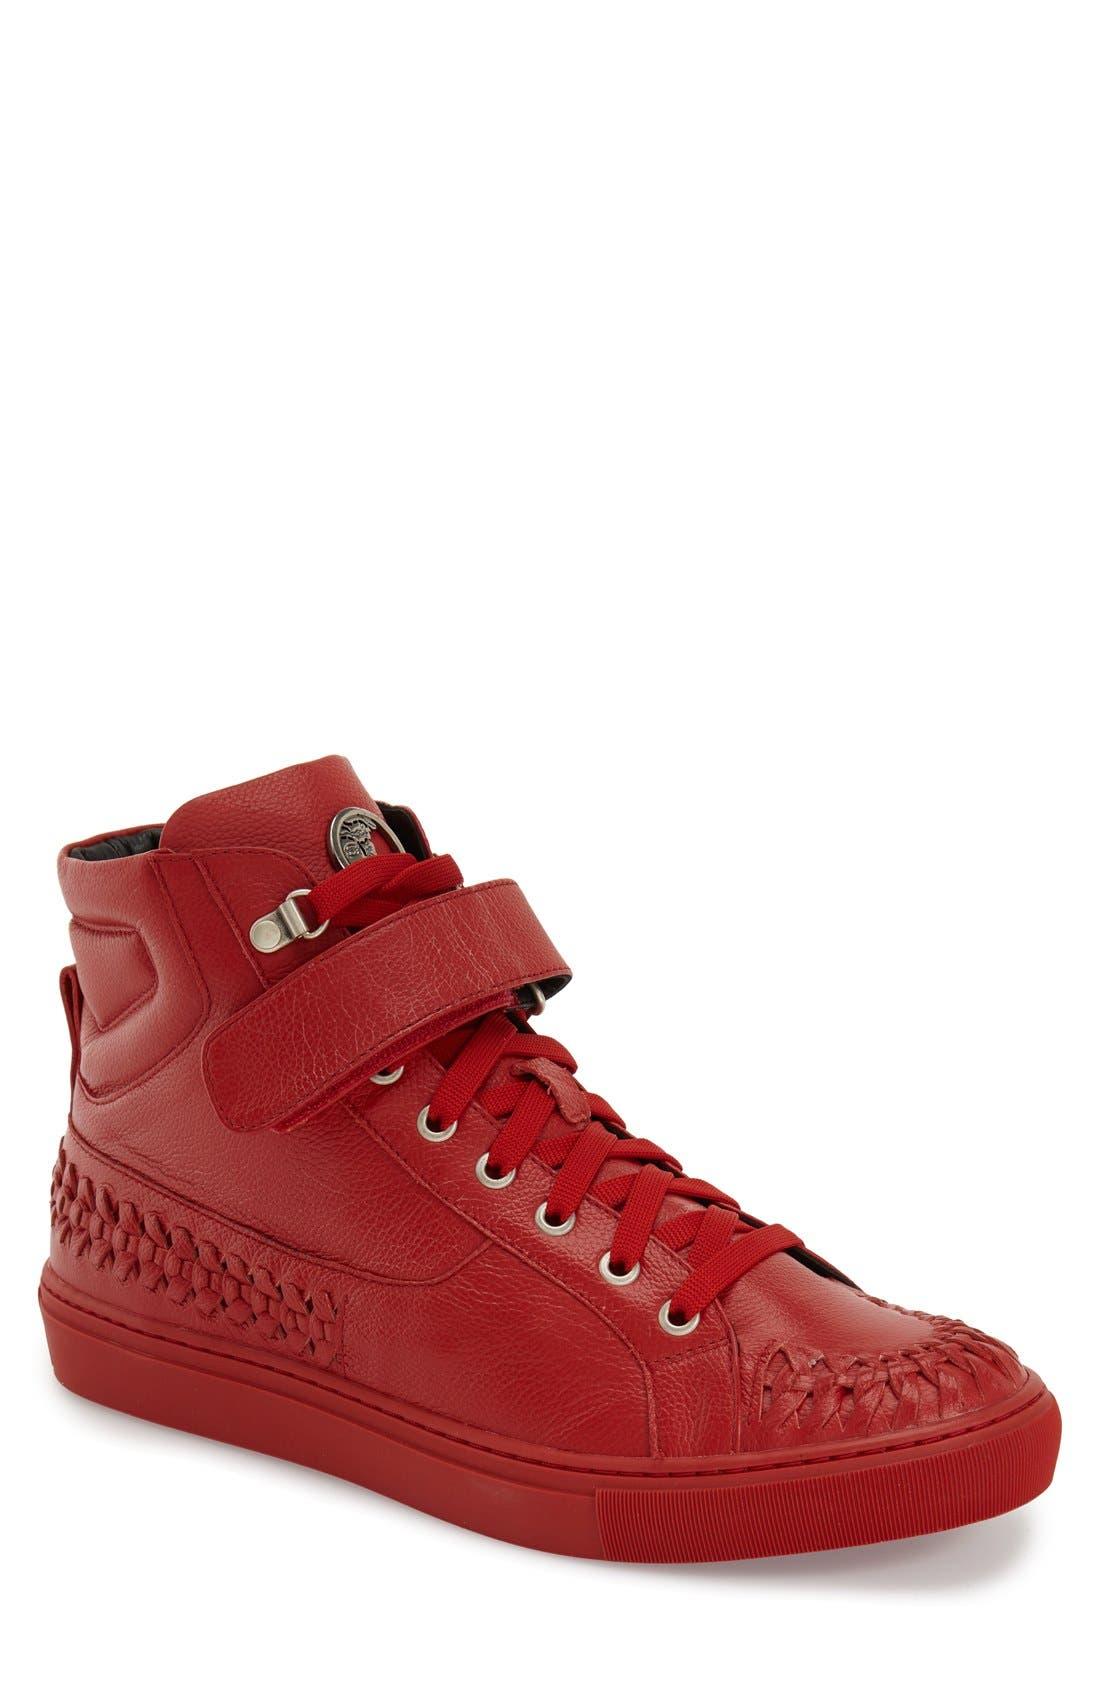 VERSACE COLLECTION Woven High Top Sneaker, Main, color, 600